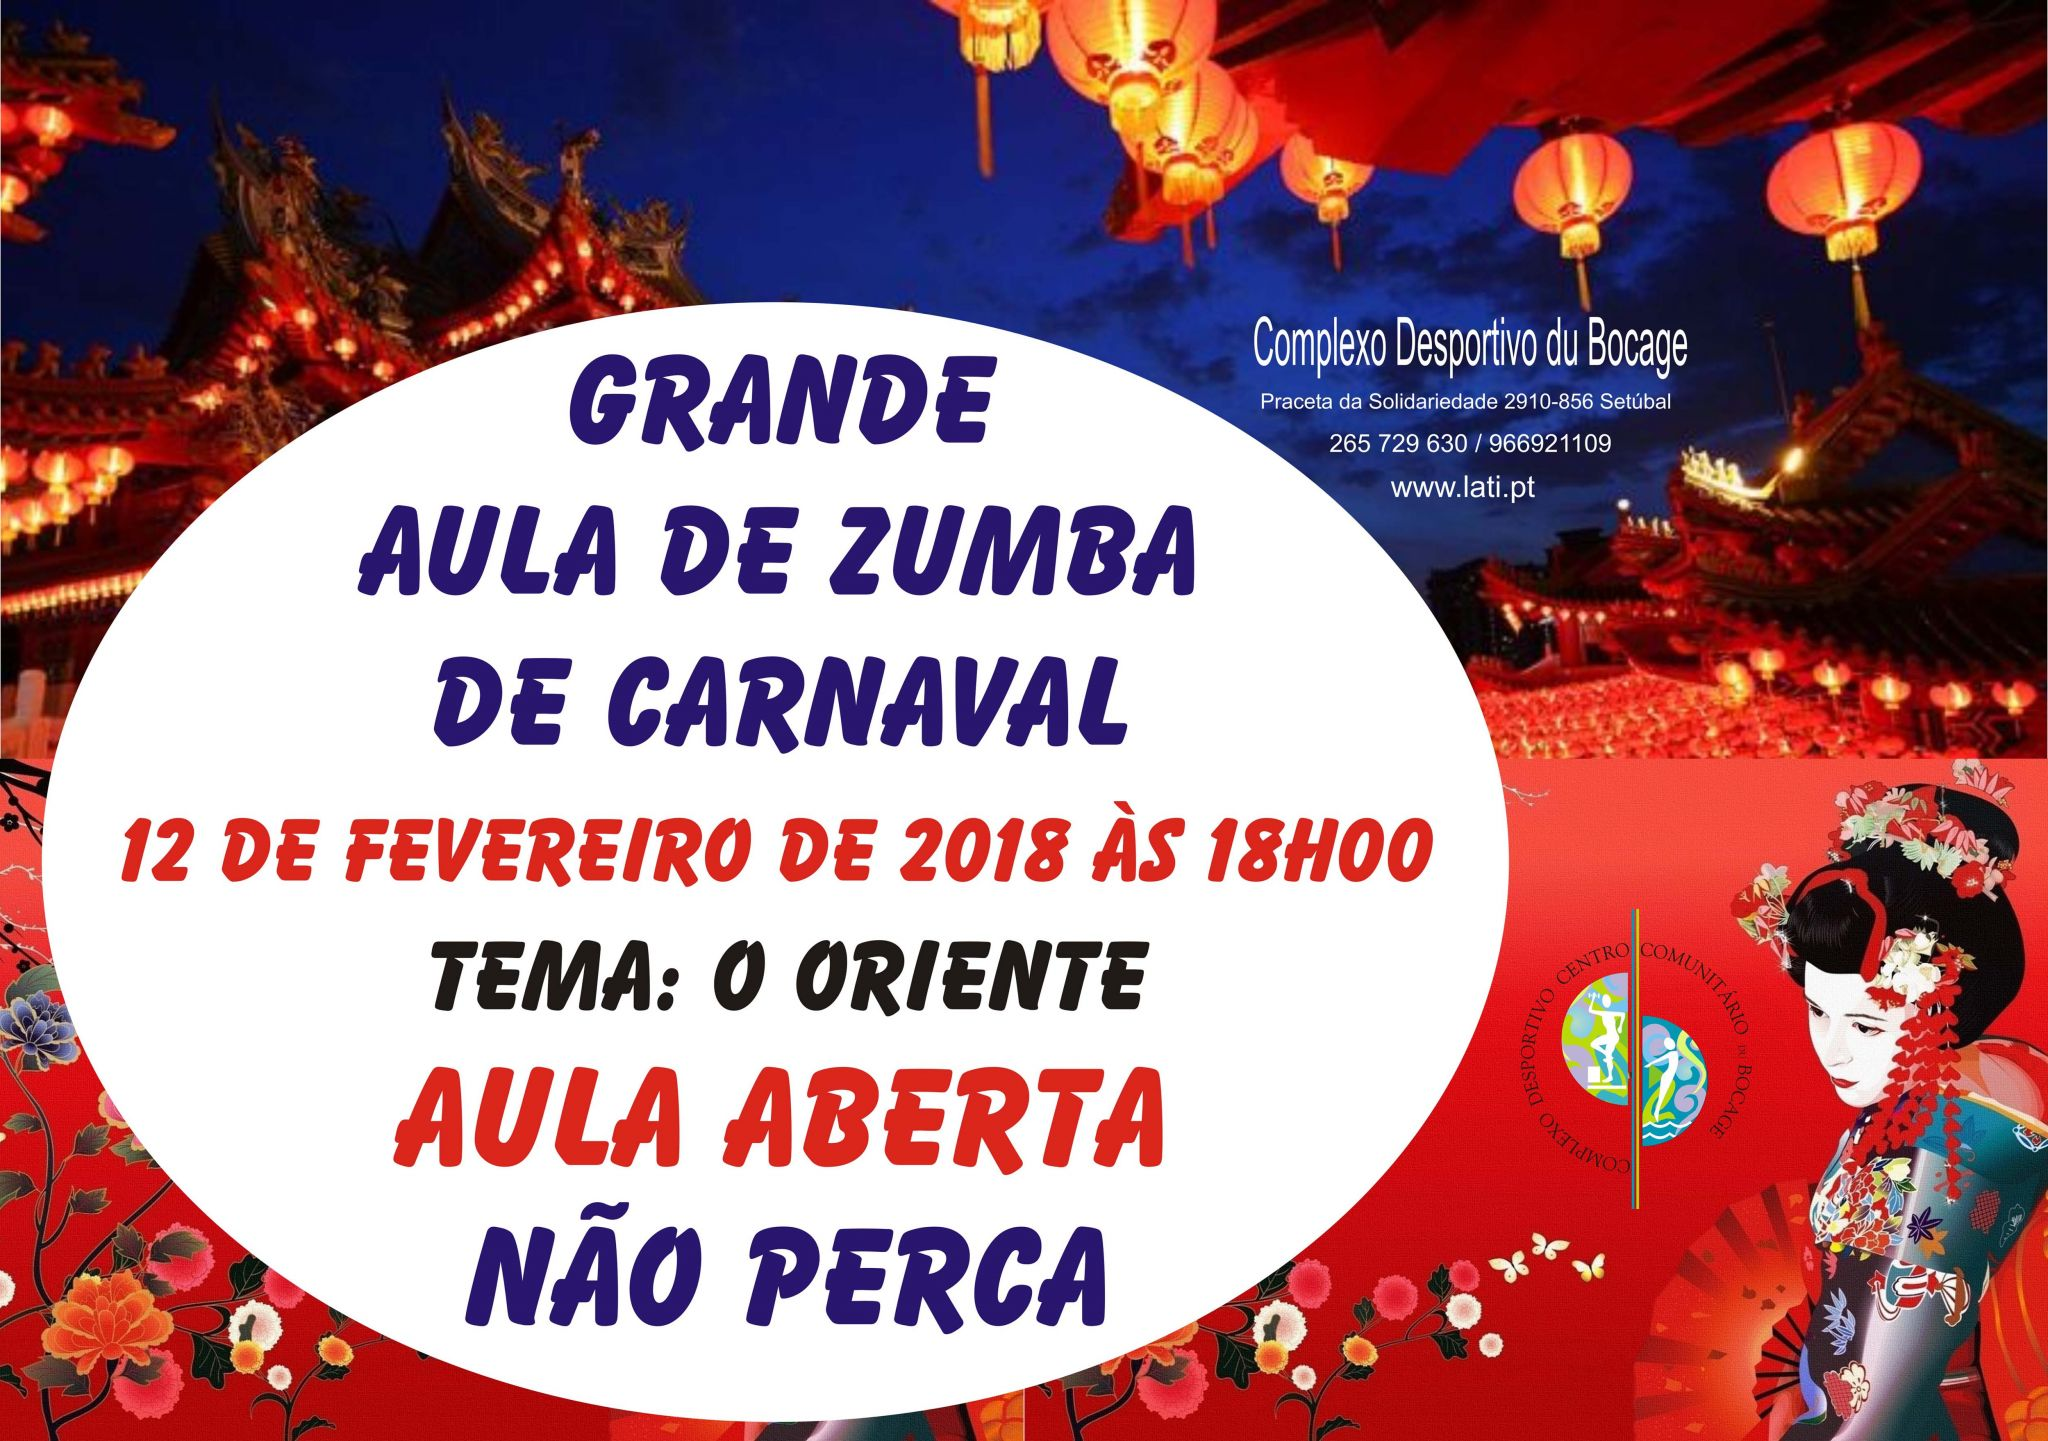 Grande aula de Zumba de Carnaval